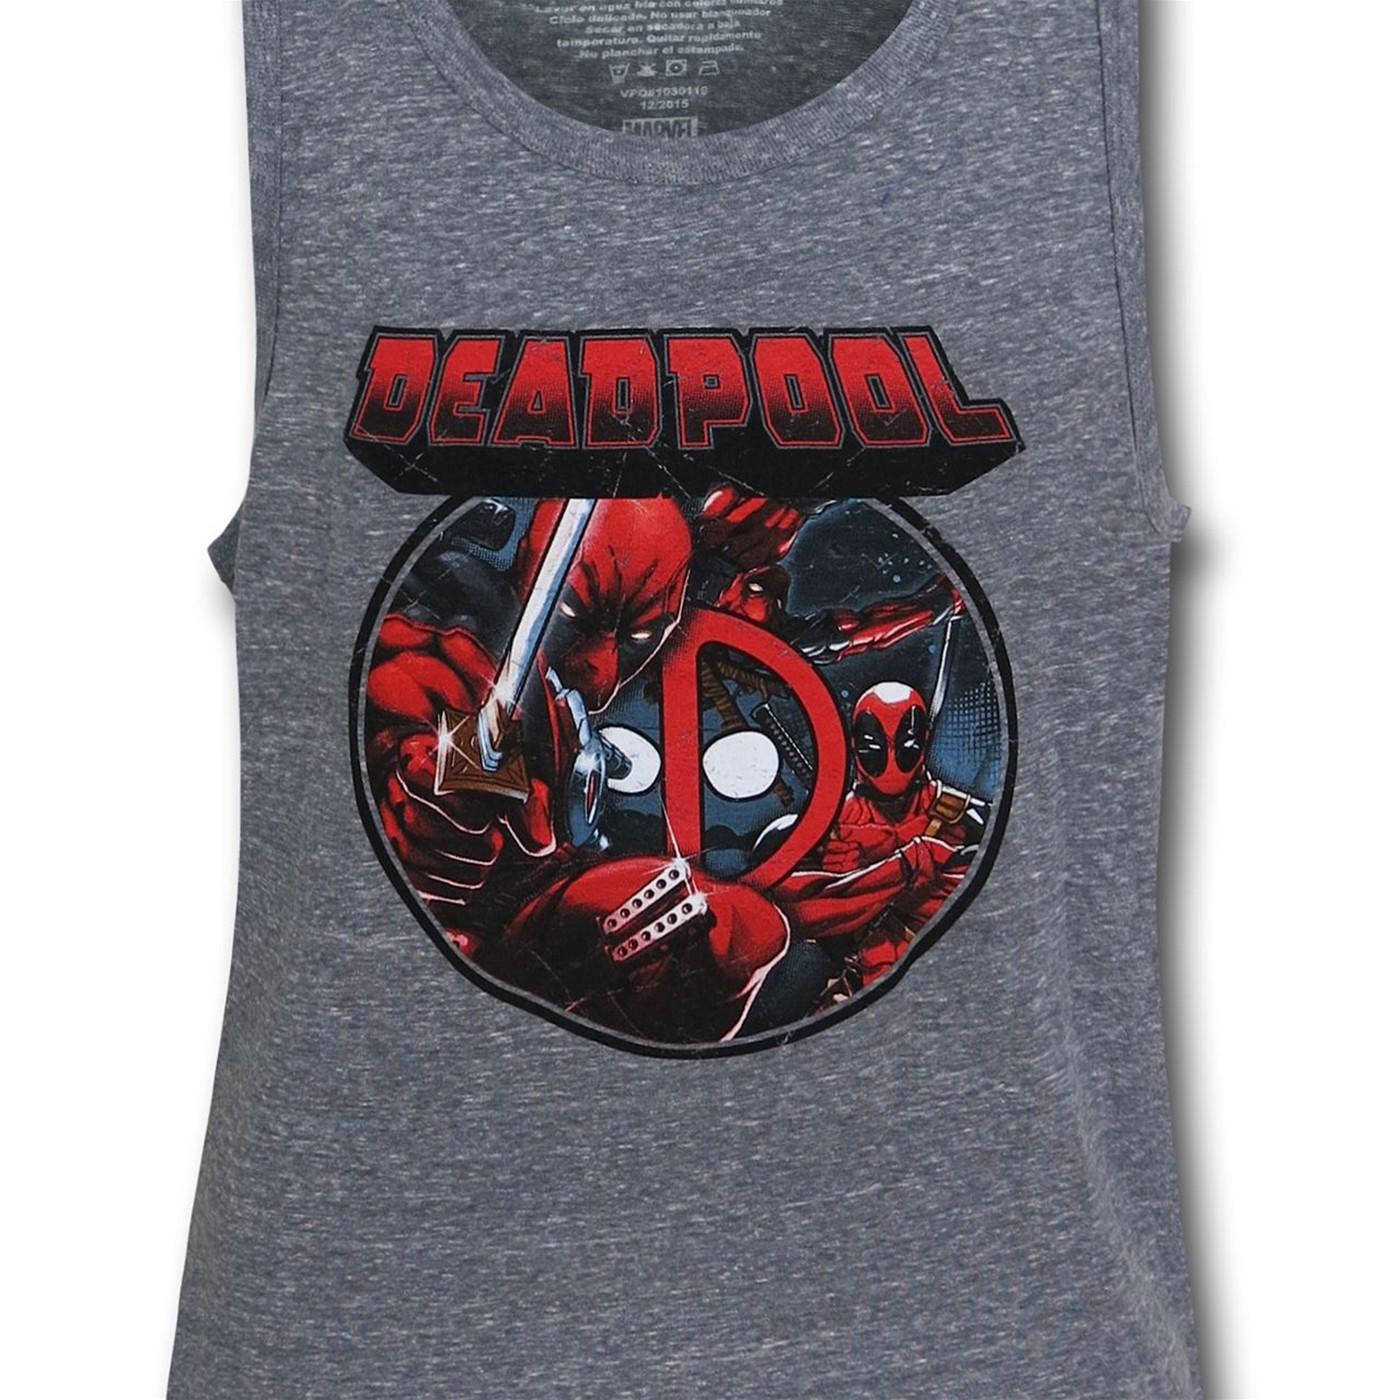 Deadpool Image Circle Tank Top